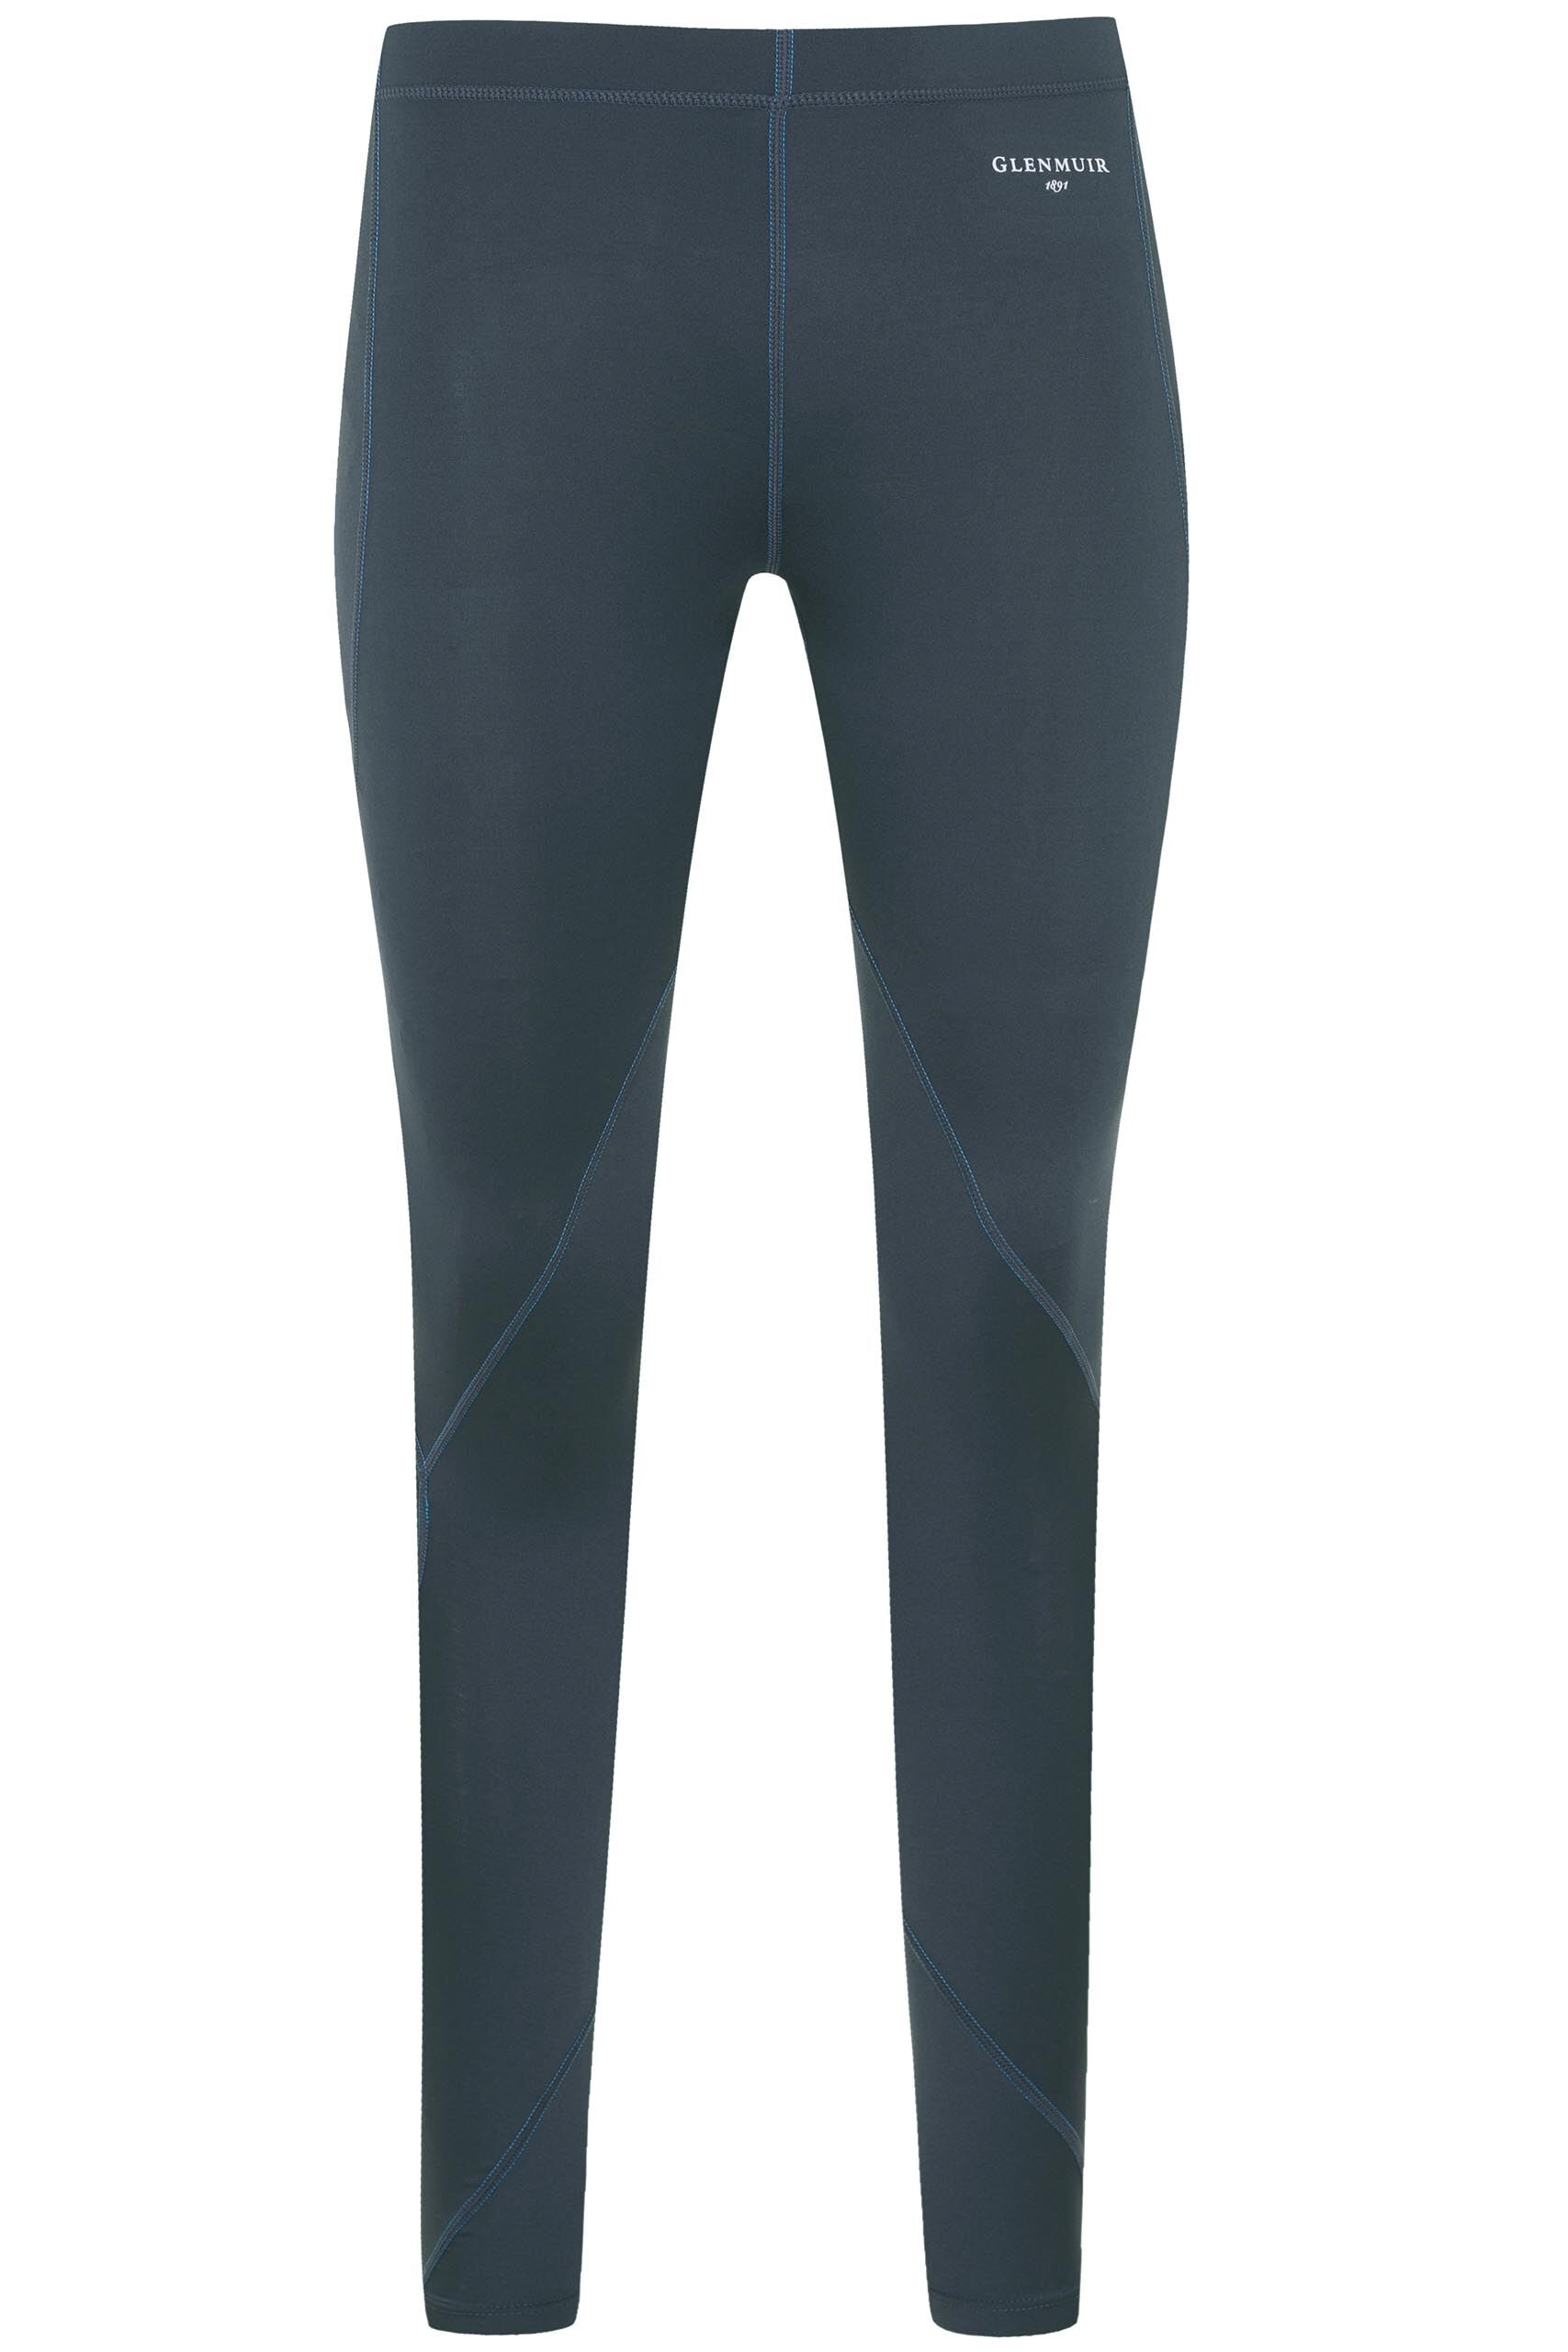 Image of 1 Pack Grey Compression Base Layer Leggings Ladies 12-14 Ladies - Glenmuir